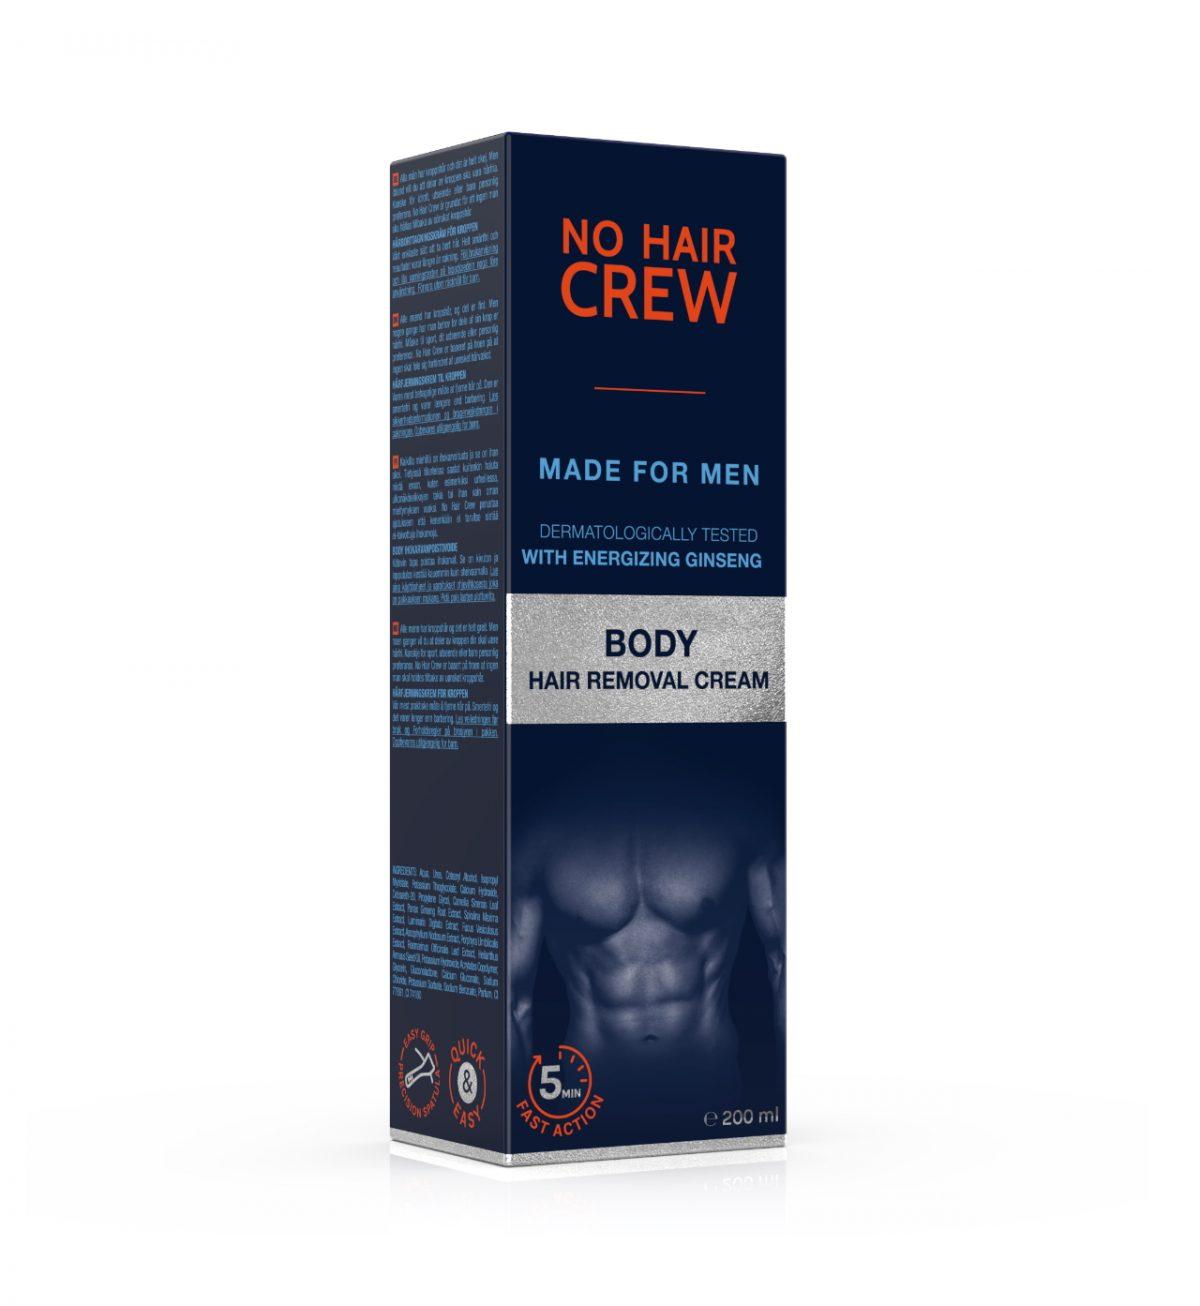 Body Hair Removal Cream -  - No Hair Crew